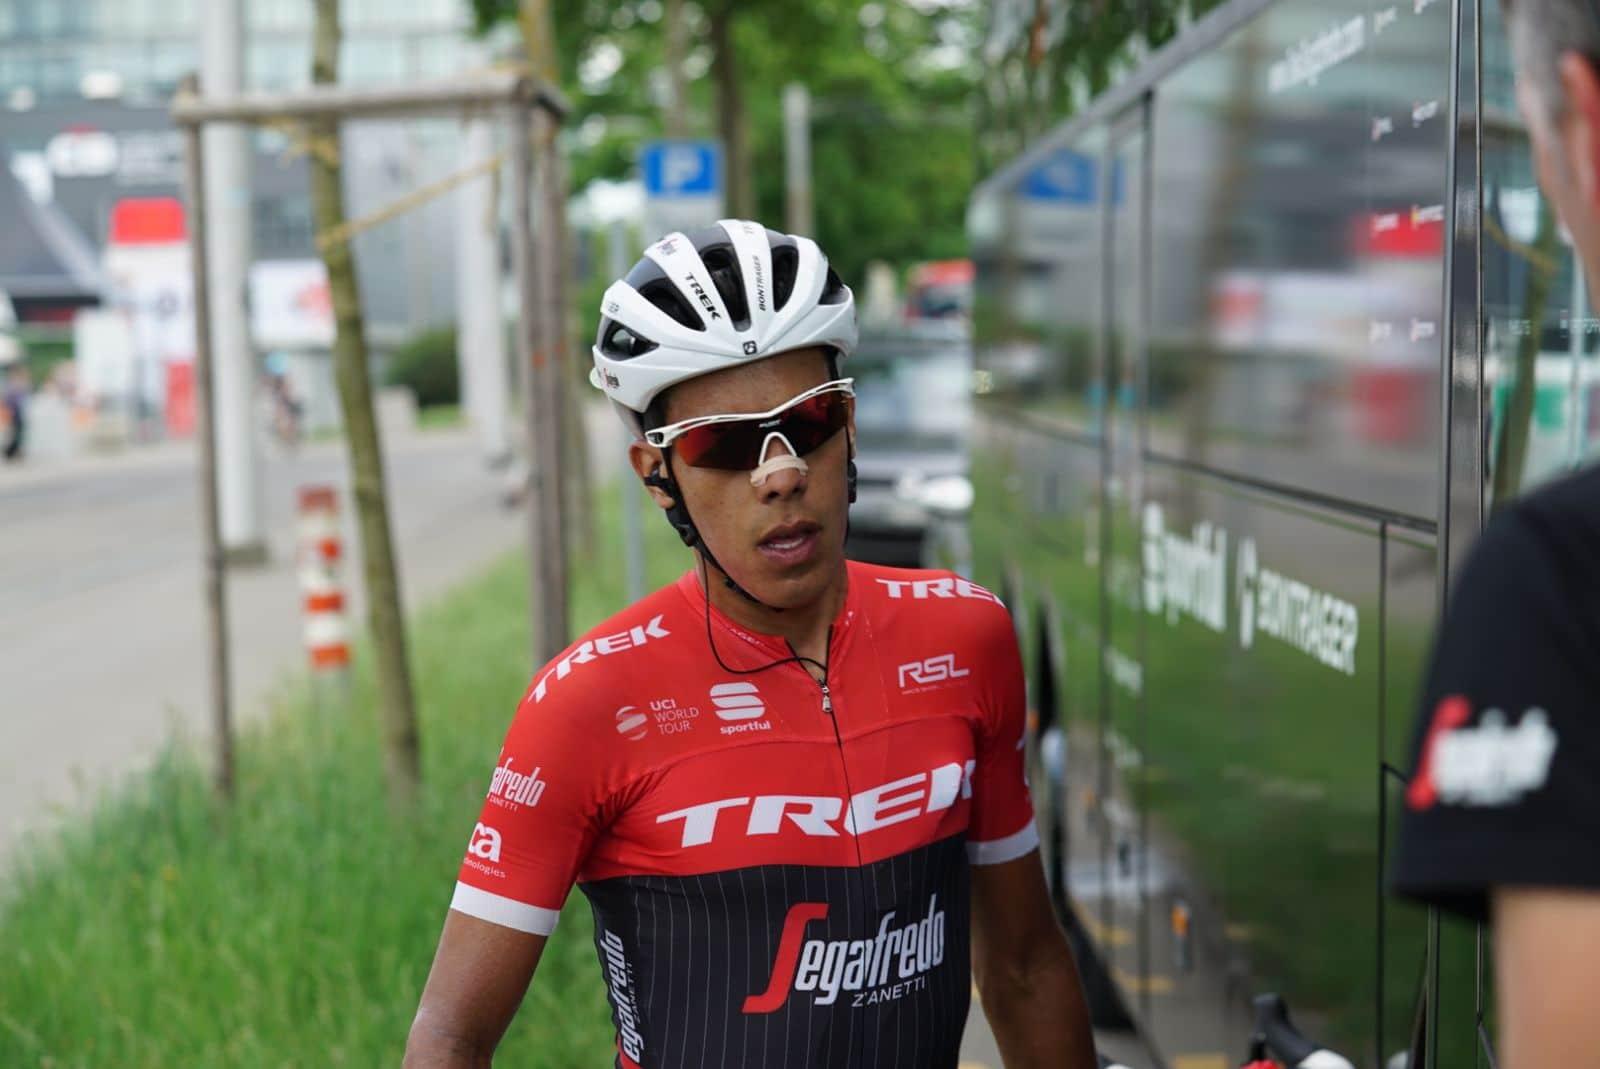 Pantano contrôlé positif à l'EPO et suspendu — Trek-Segafredo